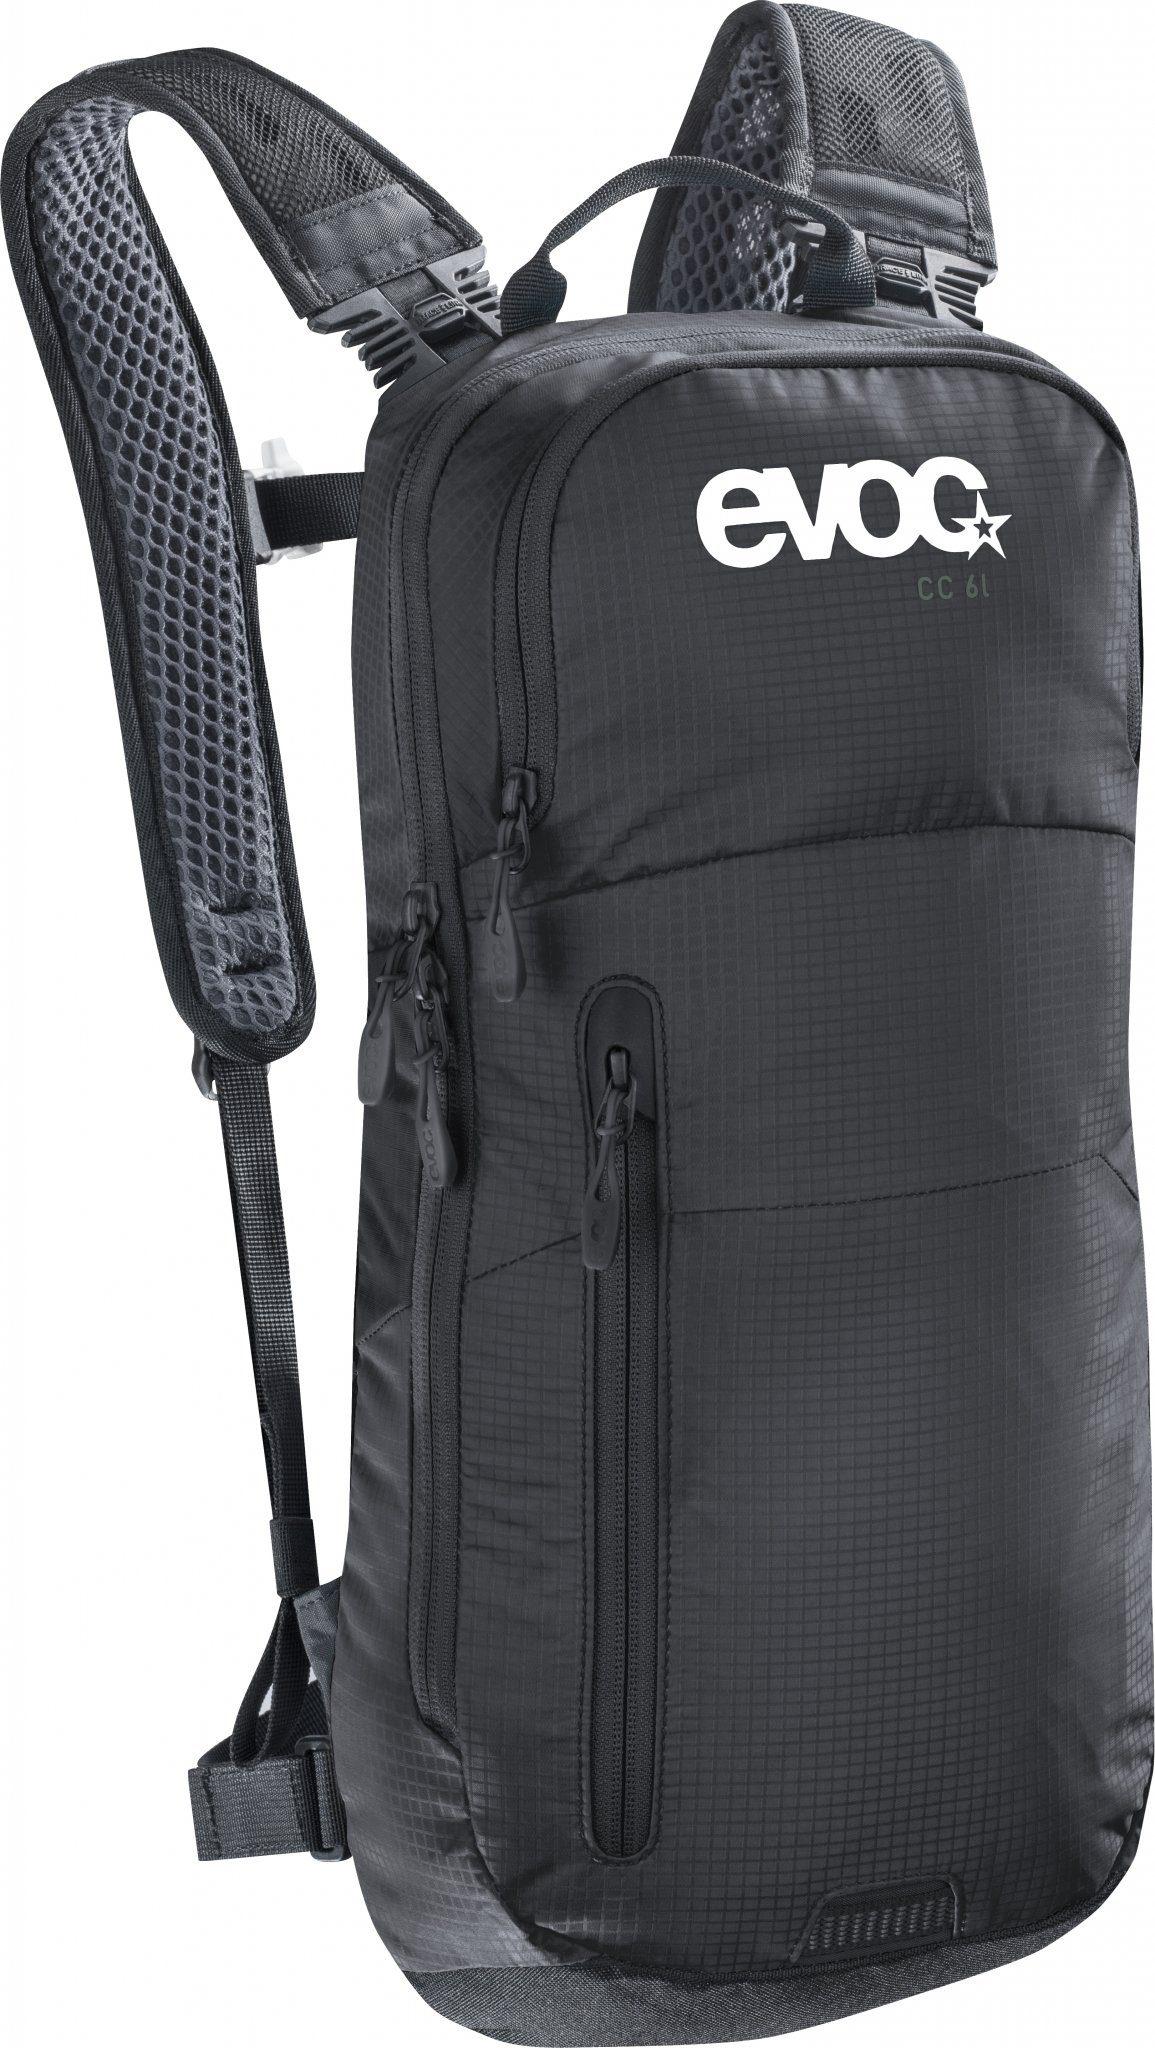 EVOC Rucksack »CC«